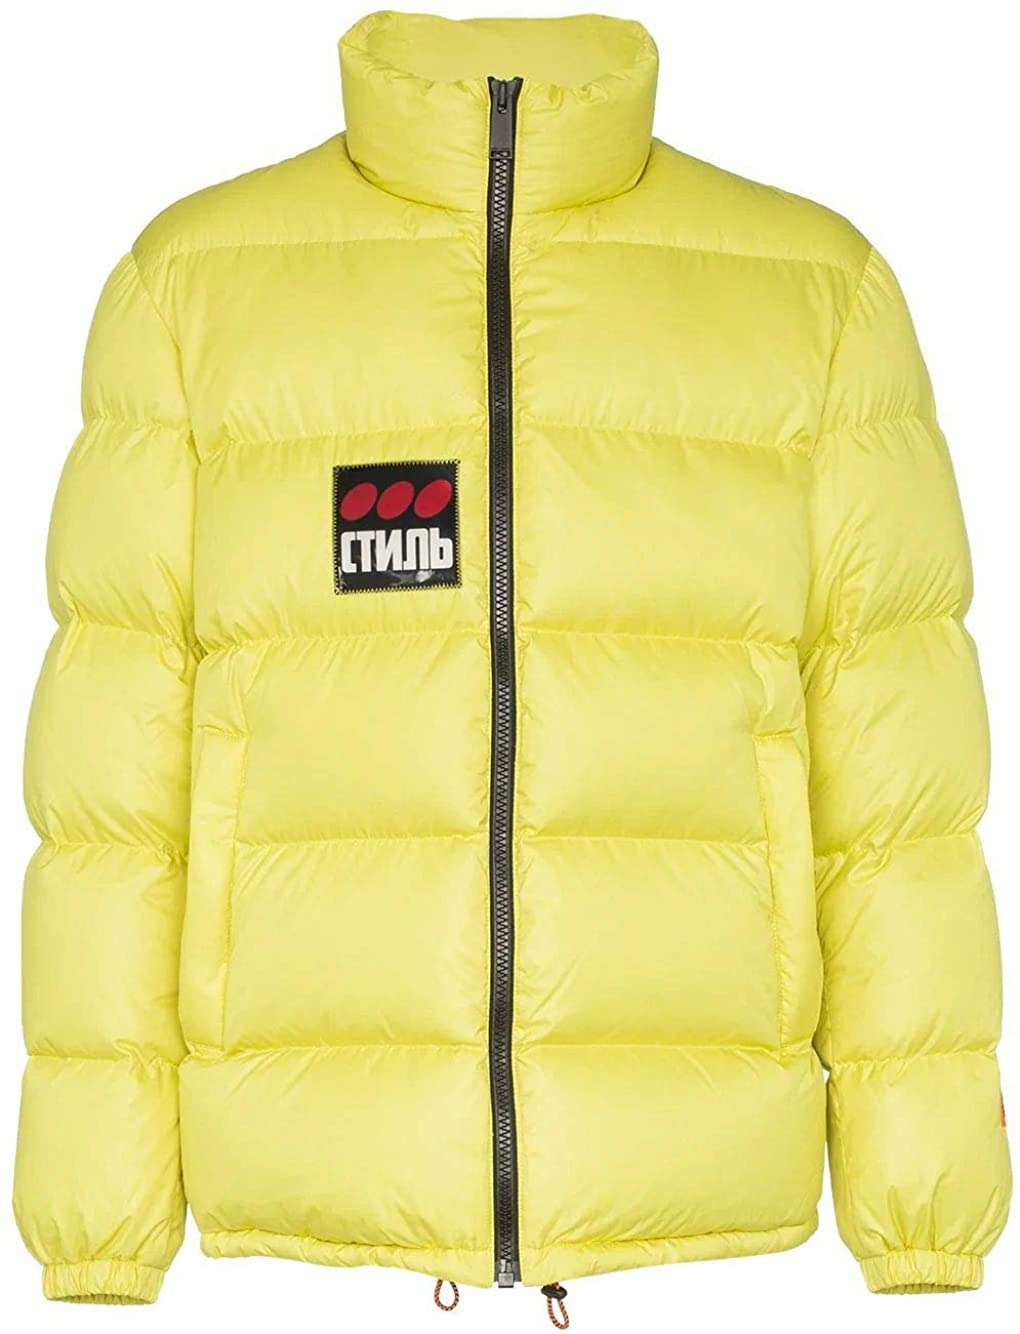 HERON PRESTON Luxury Fashion Man HMED001F197860041588 Yellow Polyamide Down Jacket | Fall Winter 19